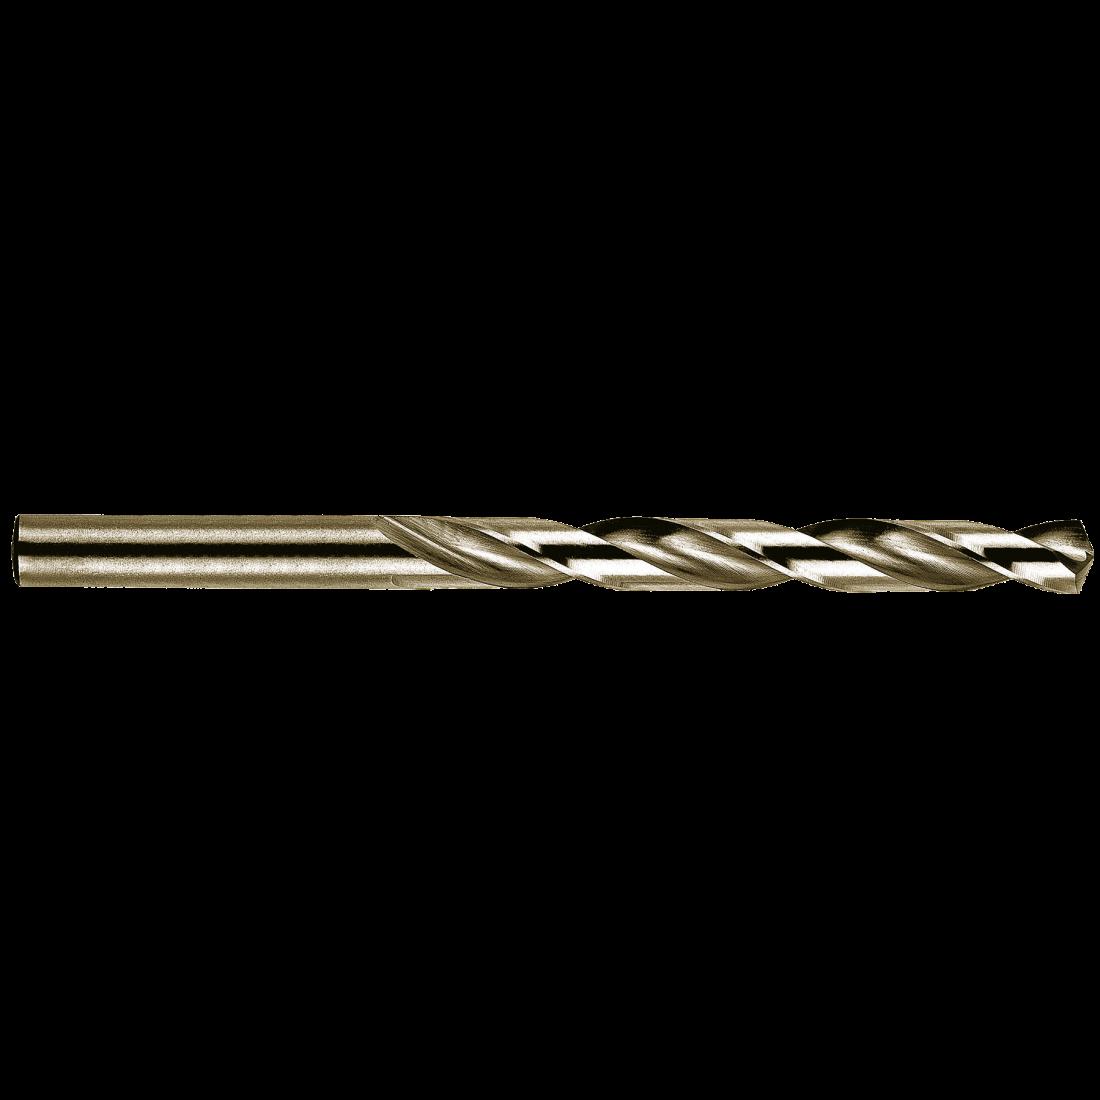 Сверло по металлу Heller НSS-Co DIN 338 RN  11x87x133мм (5шт)